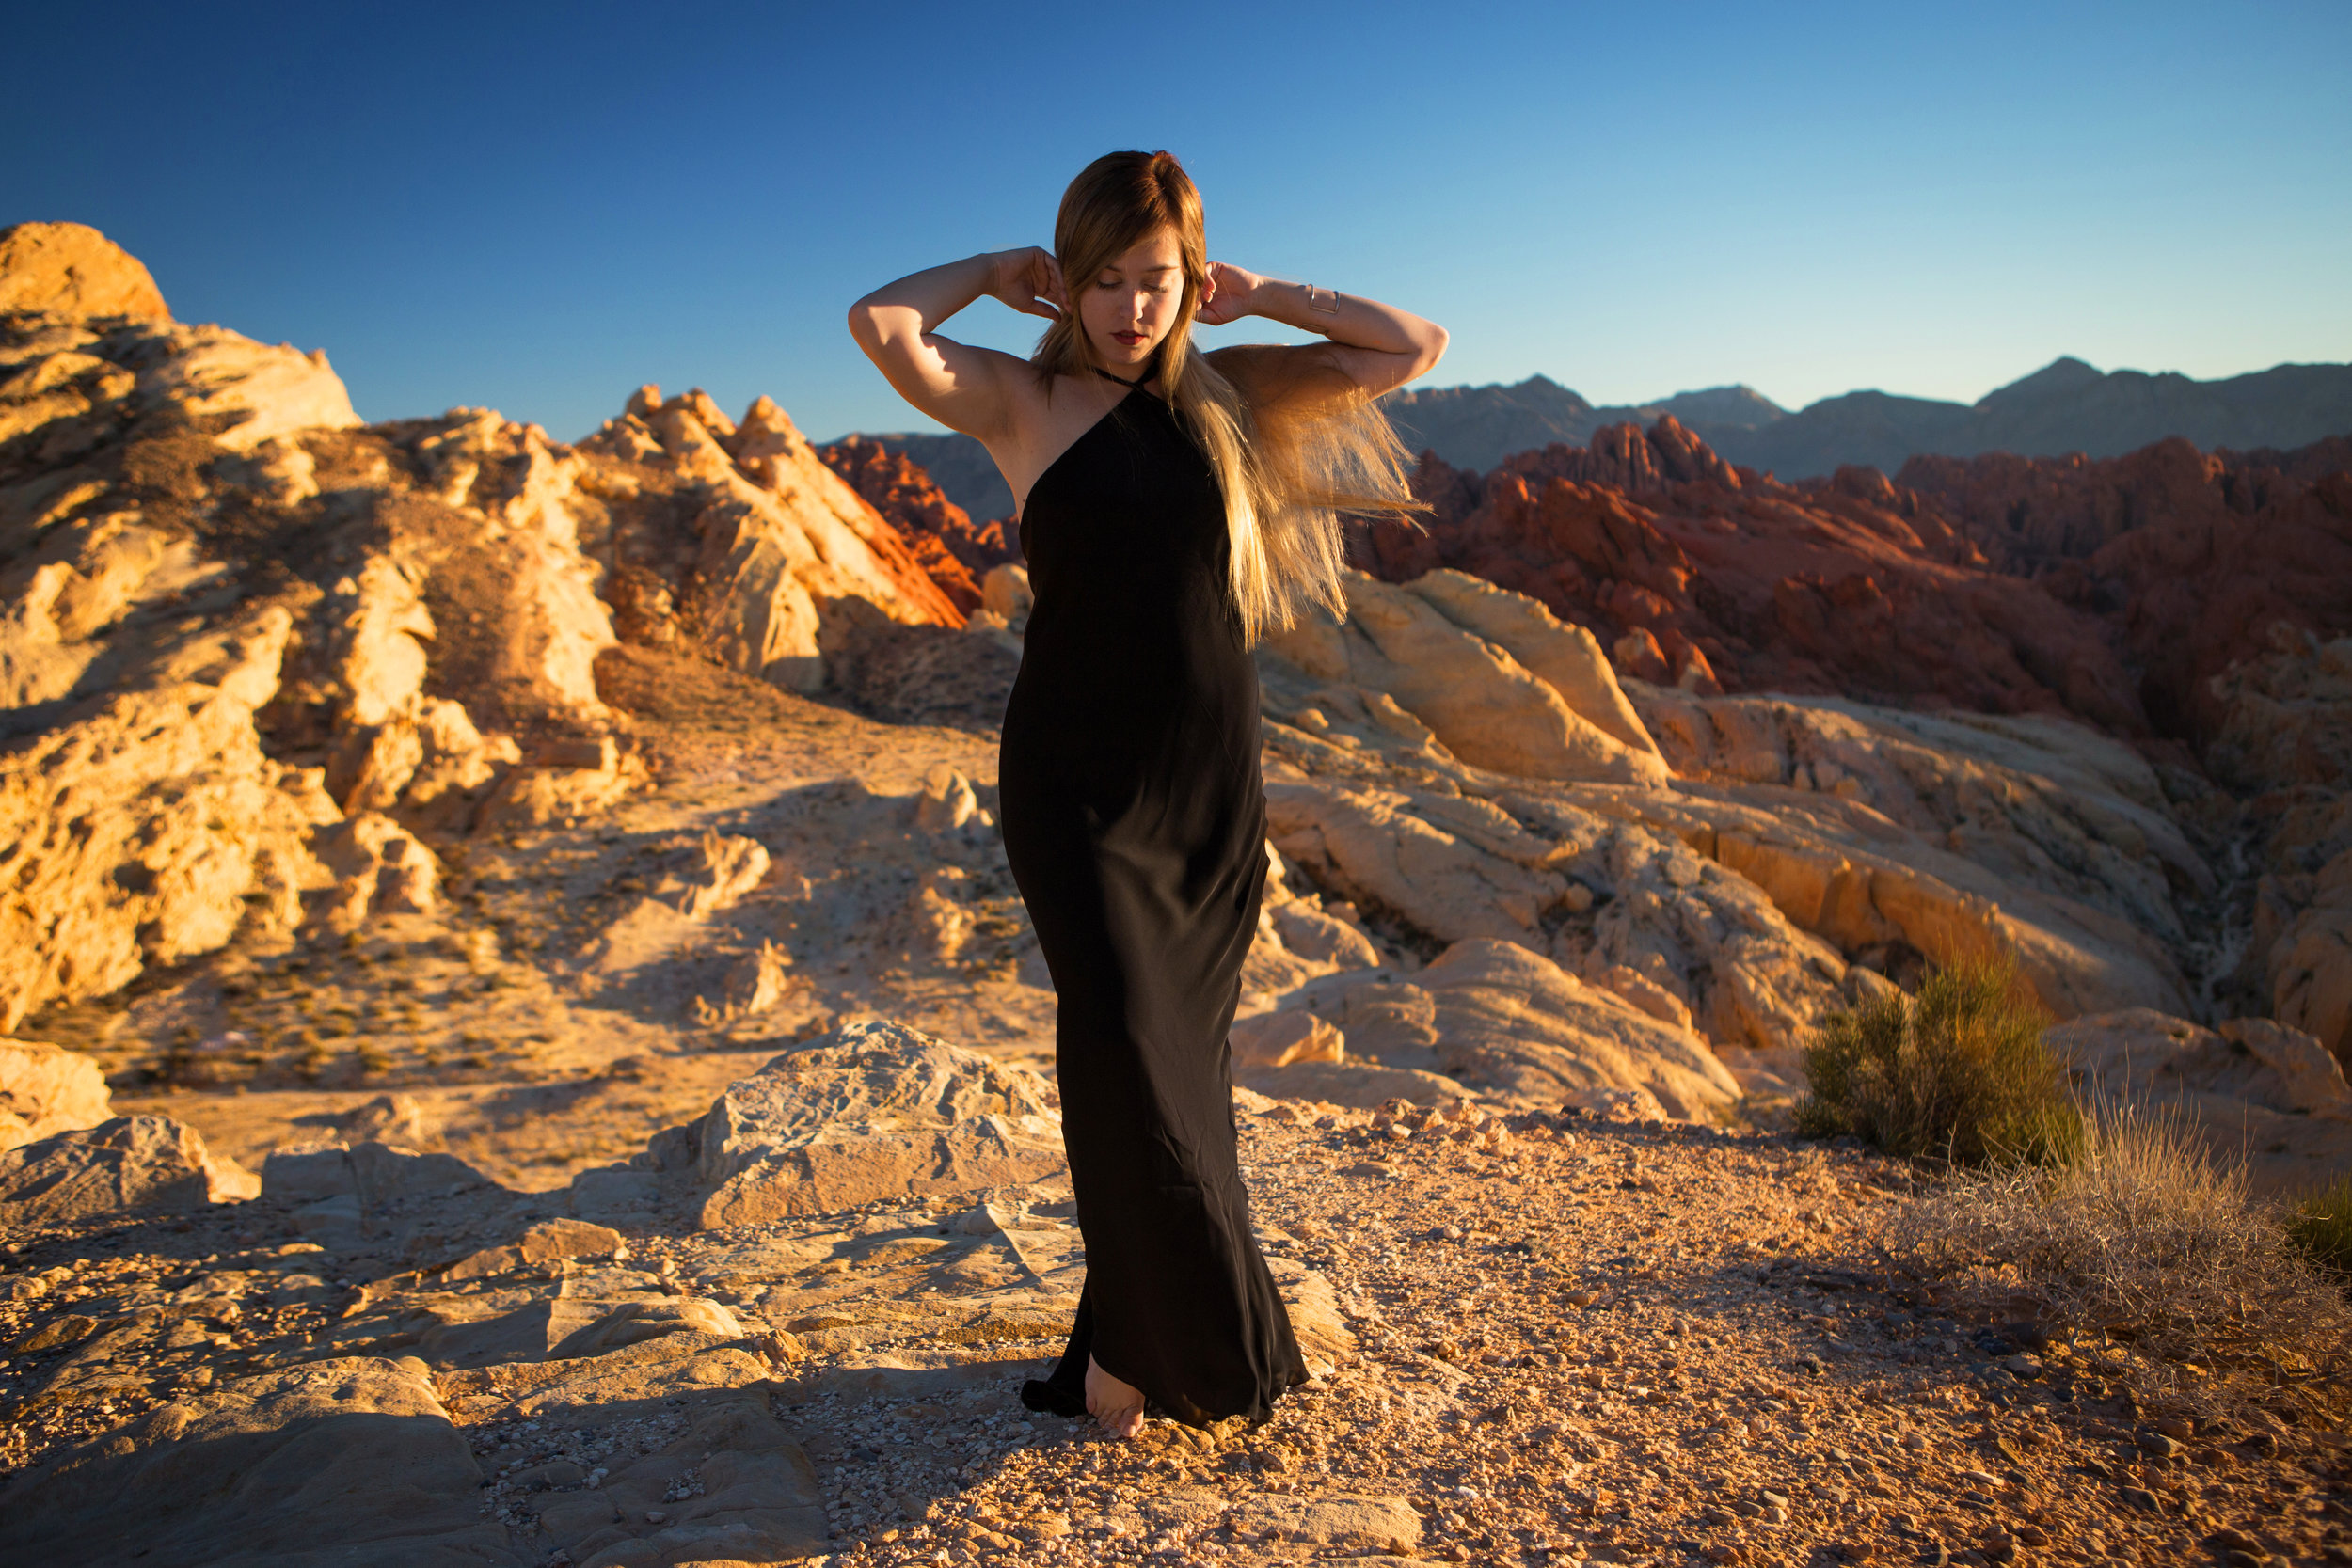 AstroBandit_JordanRose_ValleyofFire_GoldenHour_Fashion_LeonMax_3.jpg